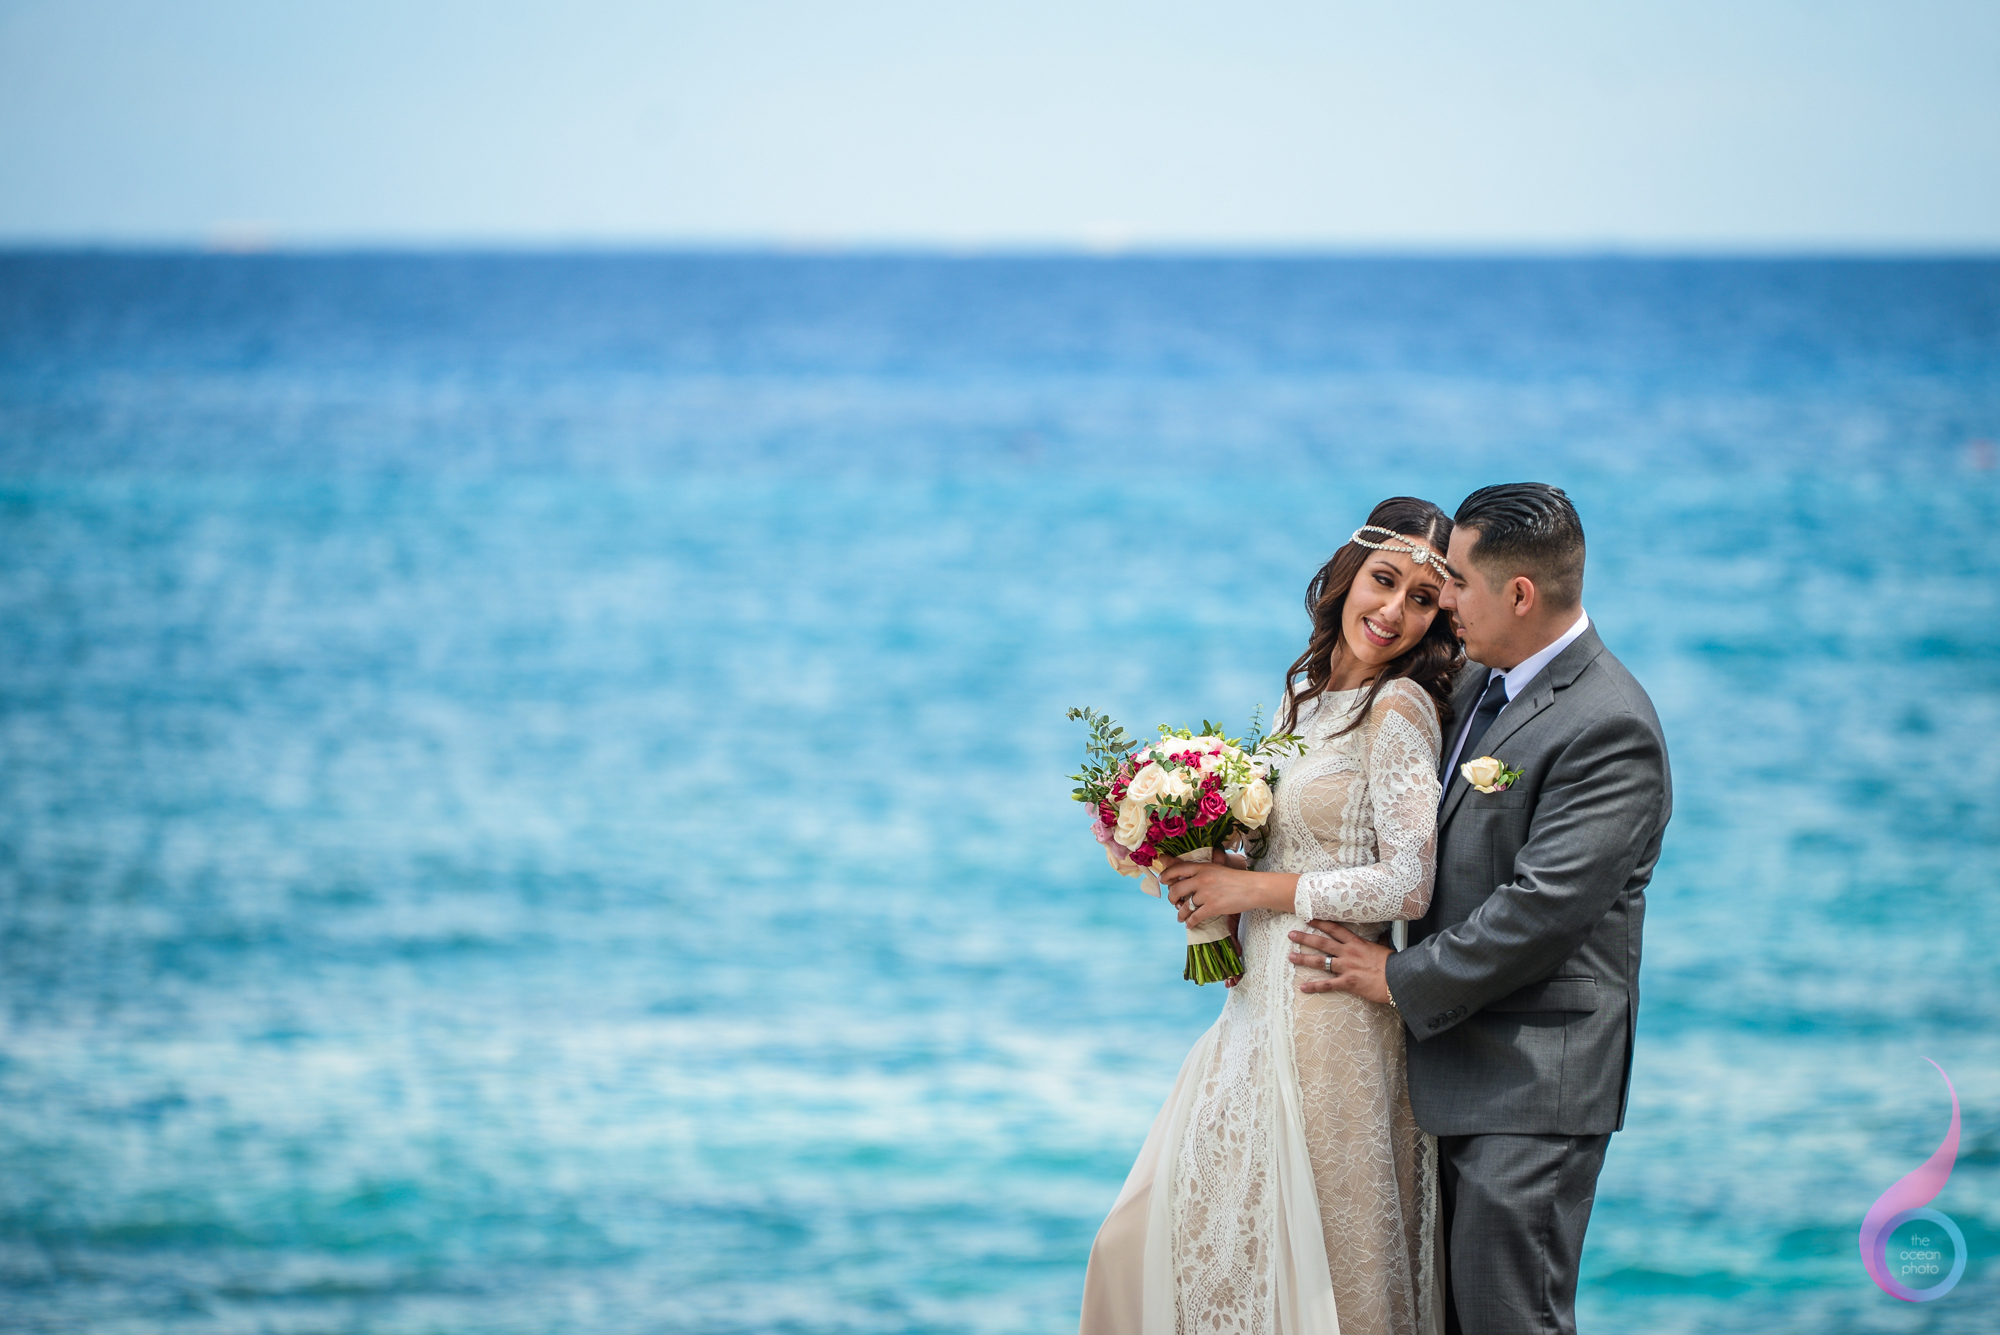 The Ocean Photo Weddings-30